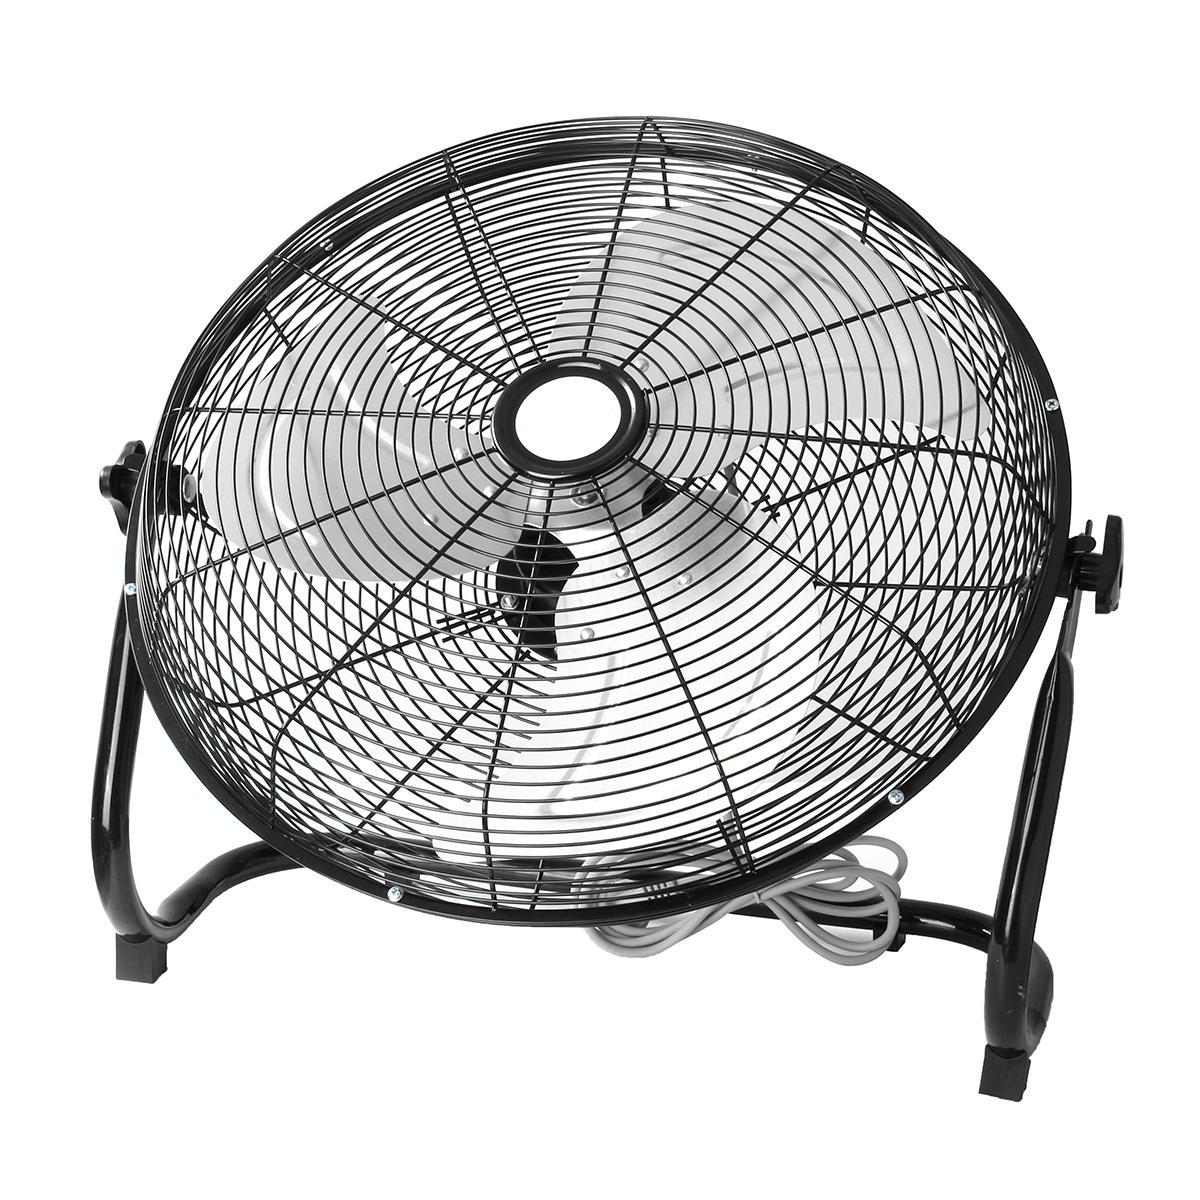 14 20 inch industrial floor desk fan high velocity air cooler rh banggood com